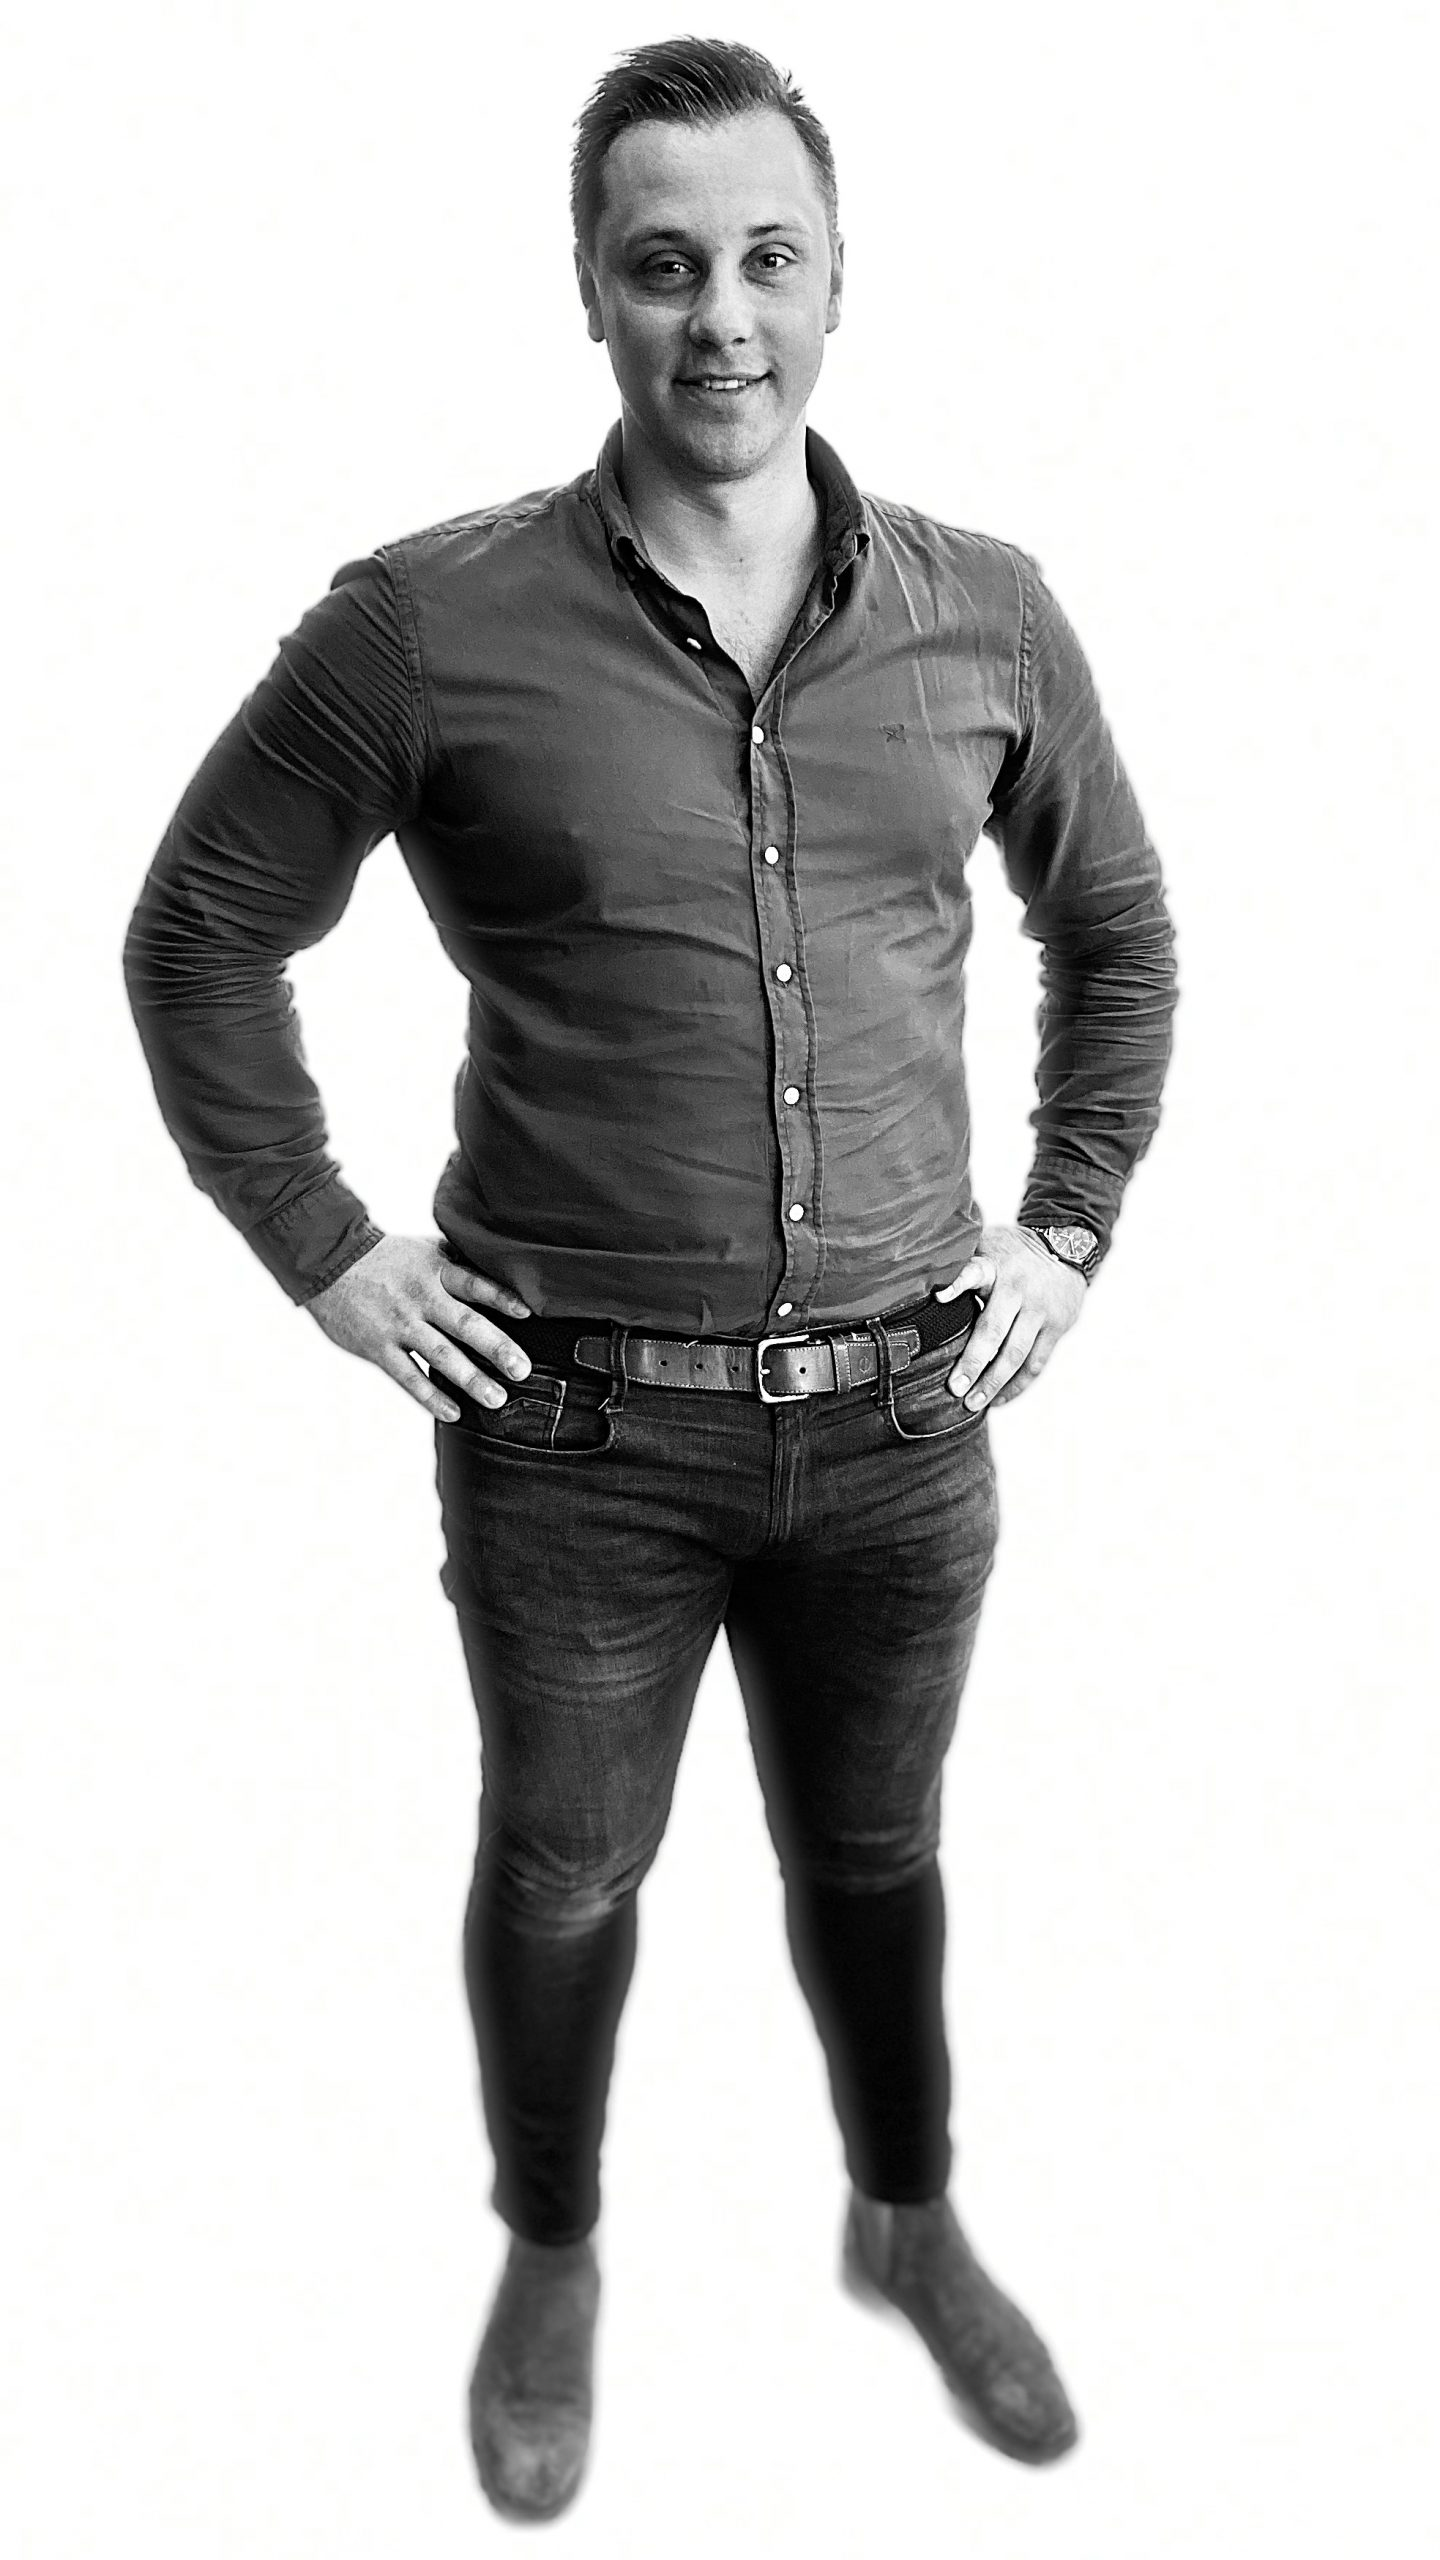 Alexander Svensson